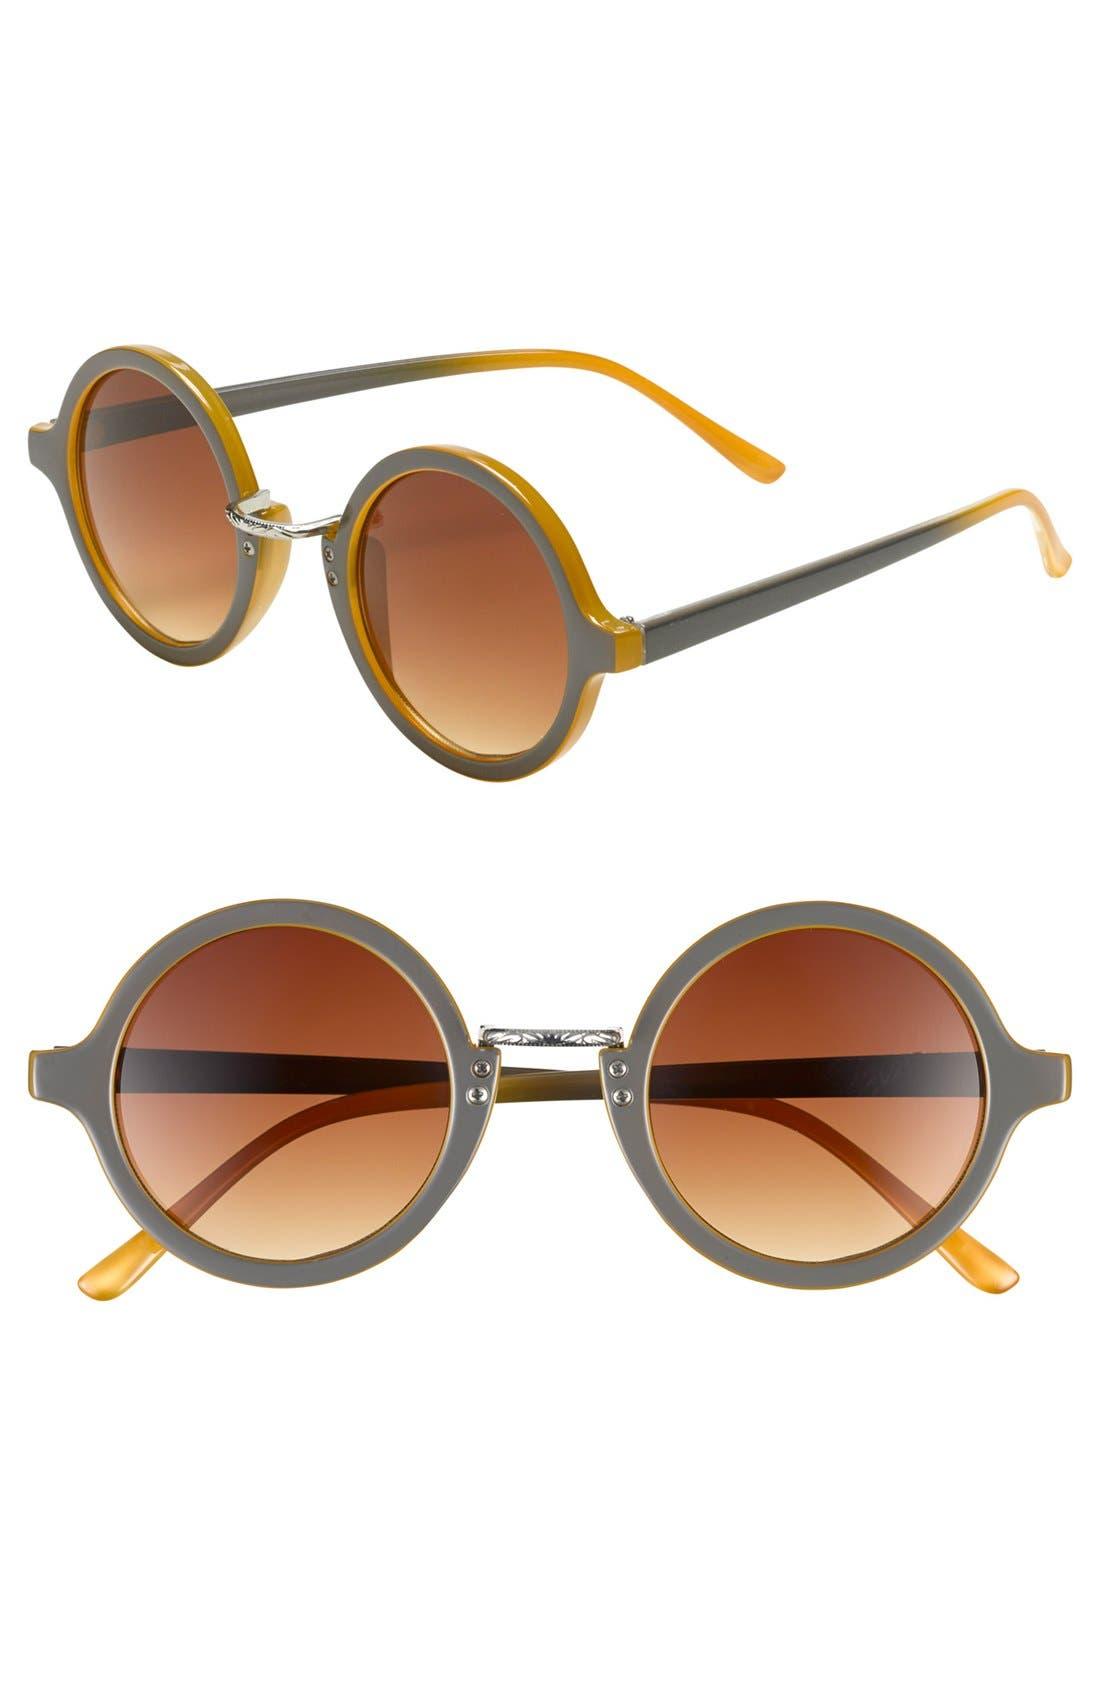 Main Image - Leith Round Sunglasses